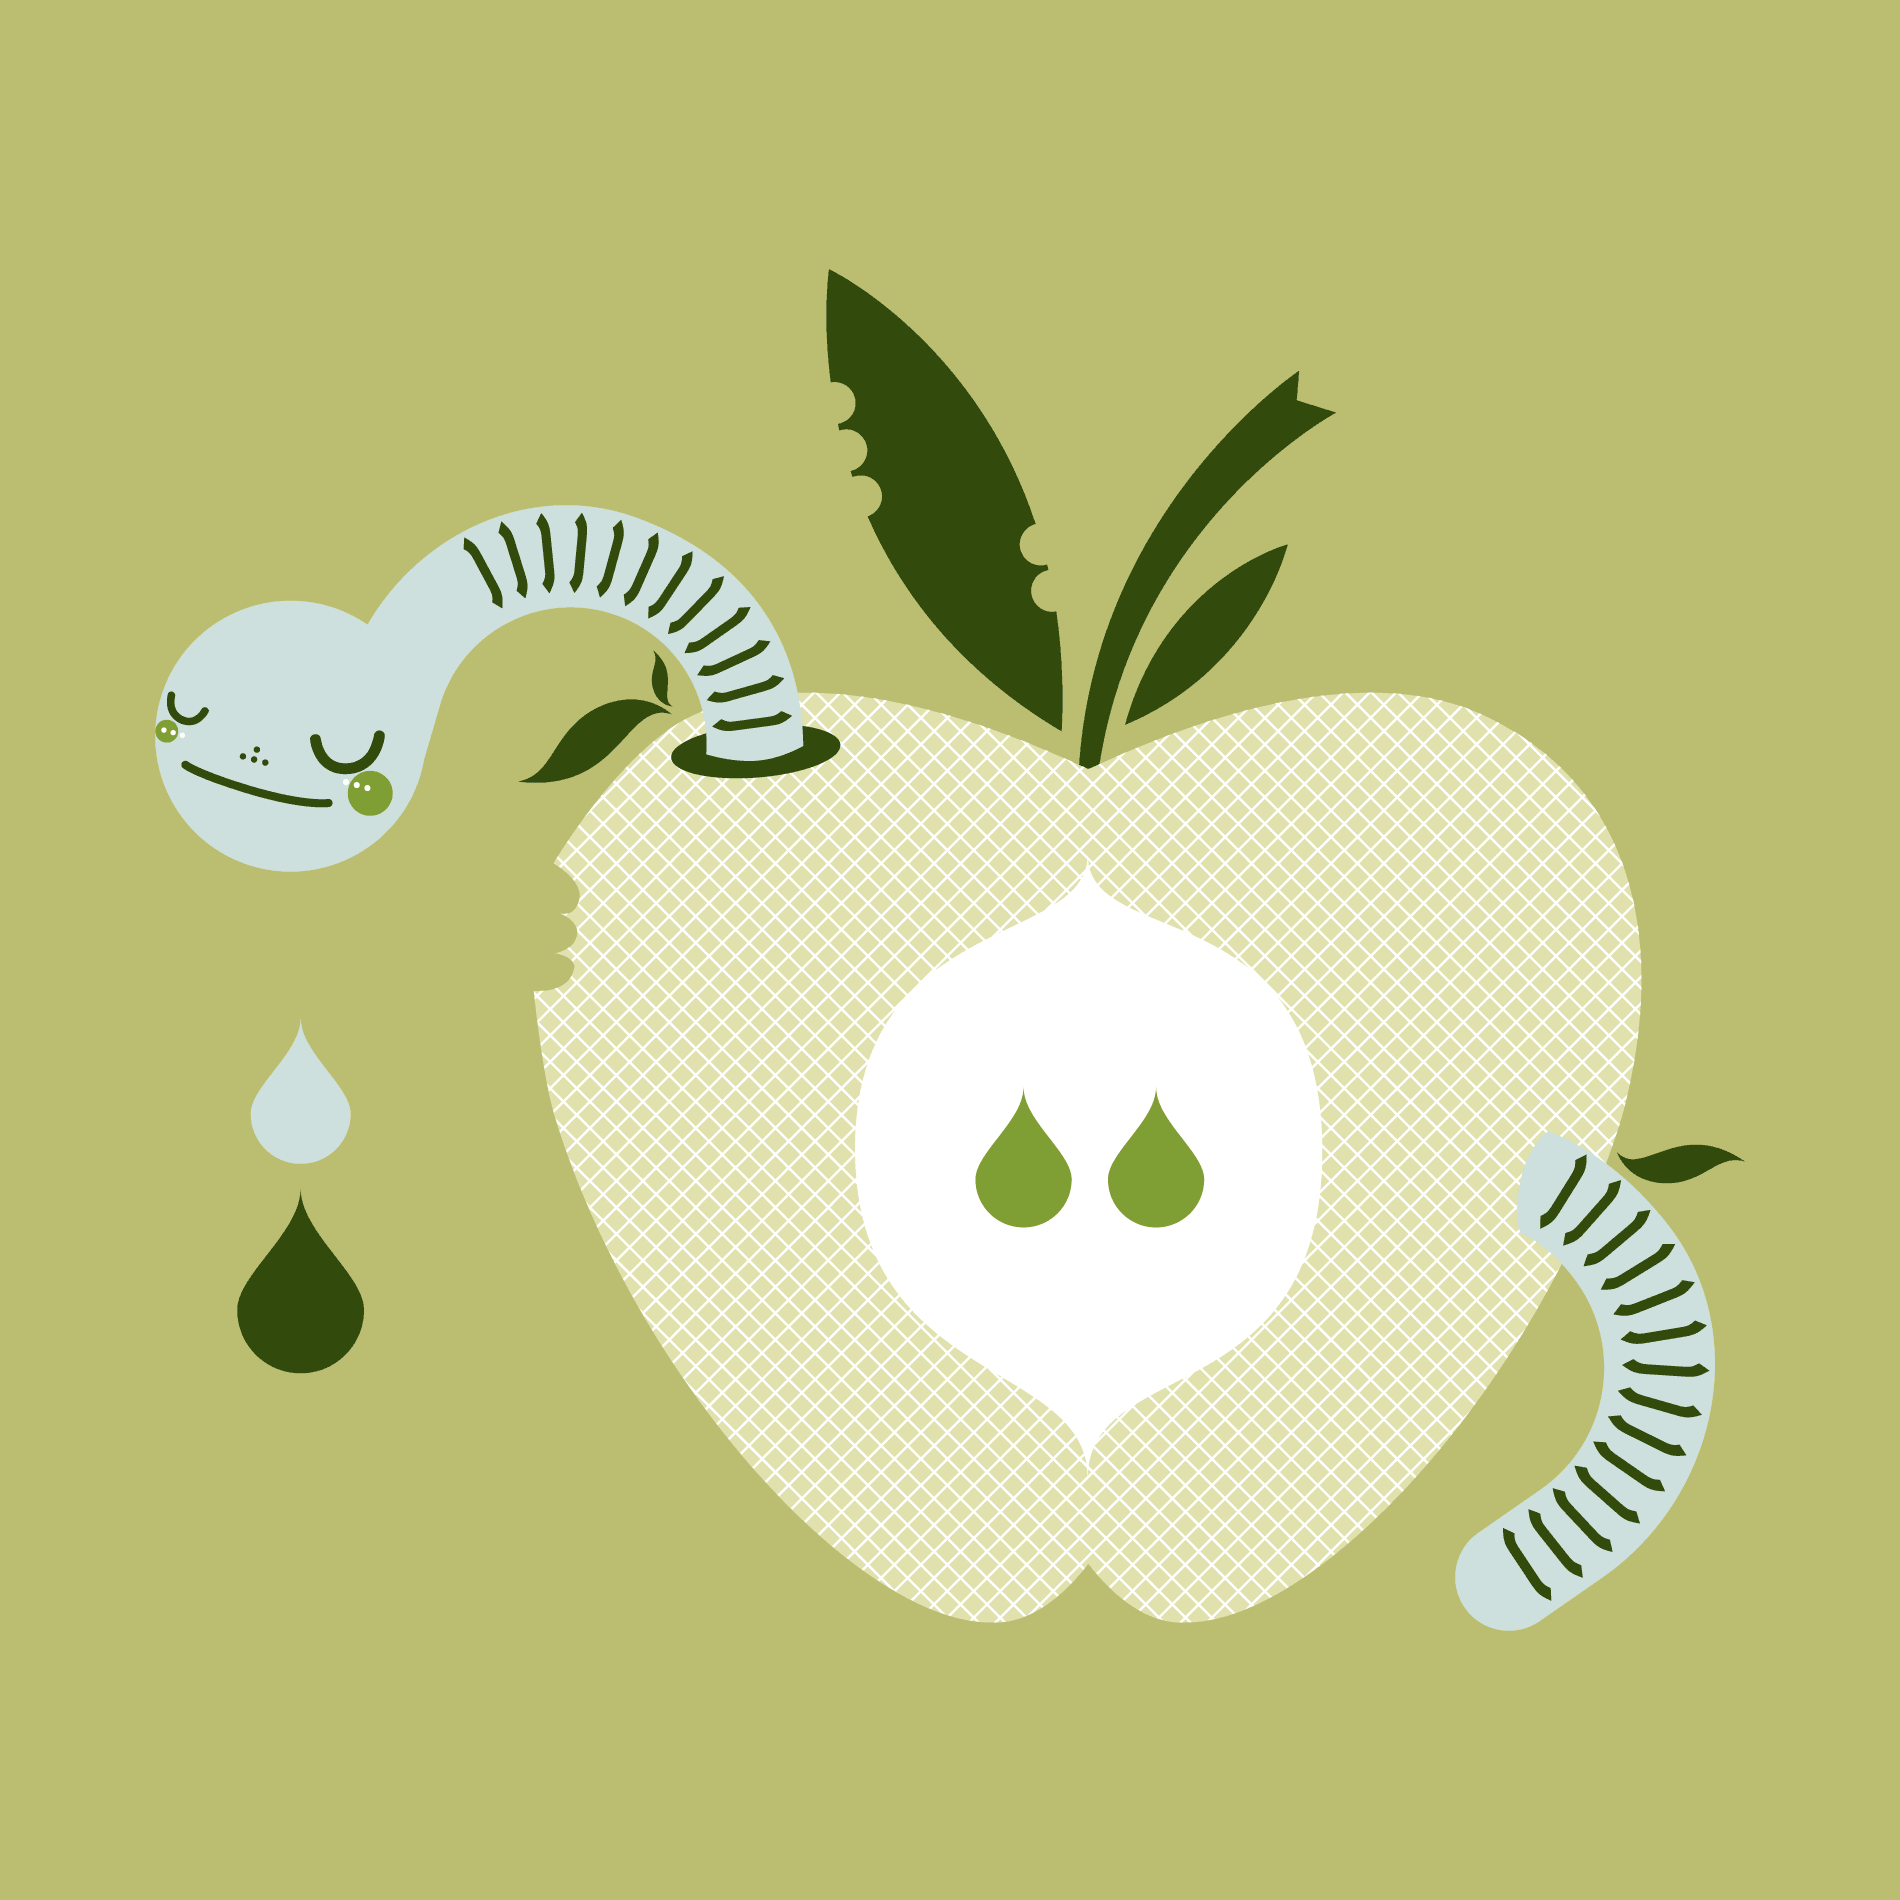 Illustration_worm_apple_sm